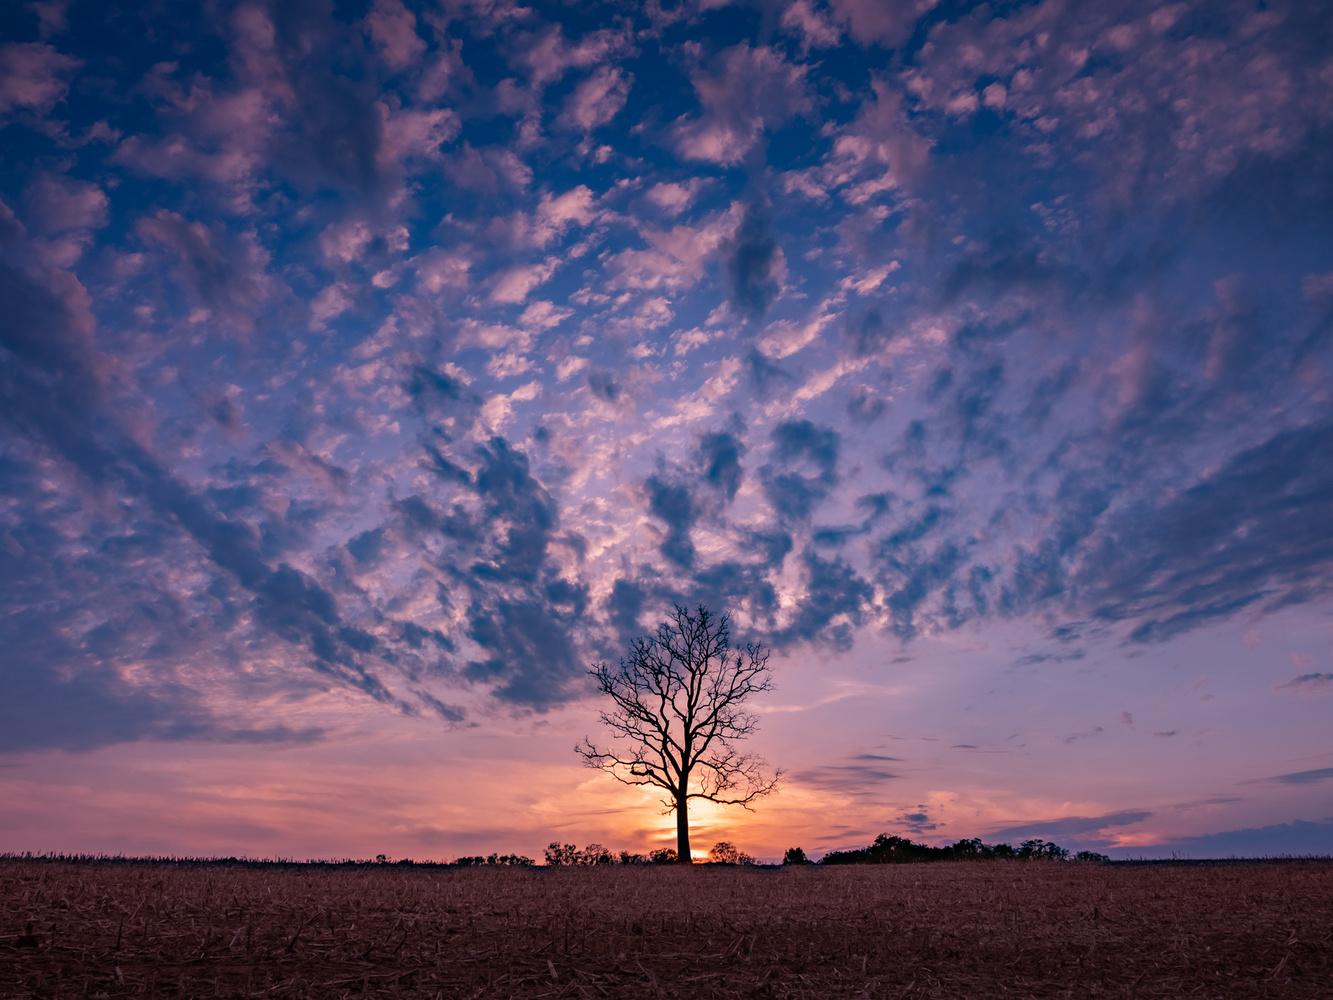 Tree in the Cornfield at Sunset by John Pszeniczny